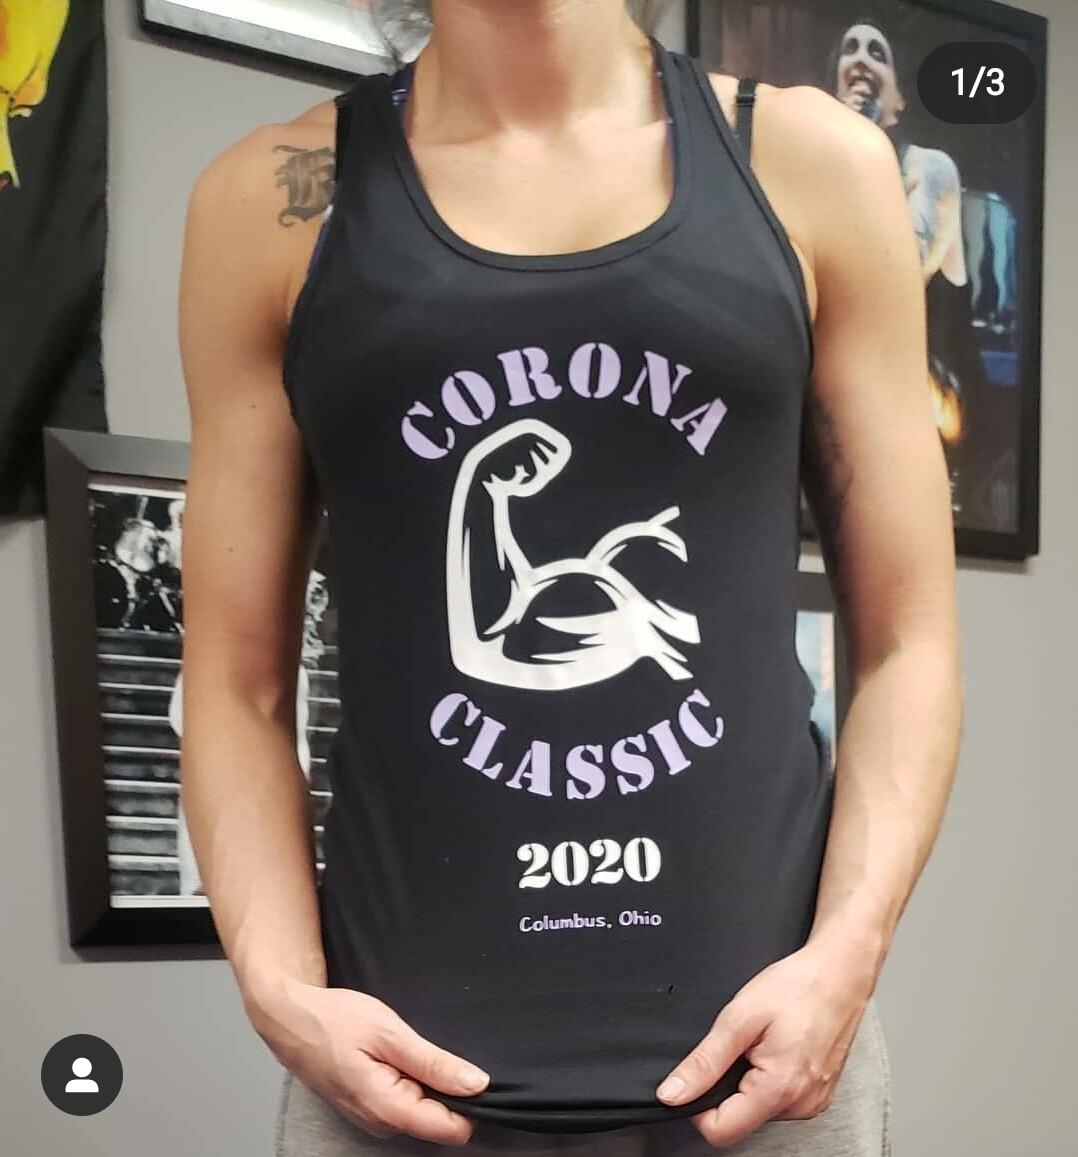 Corona Classic 2020